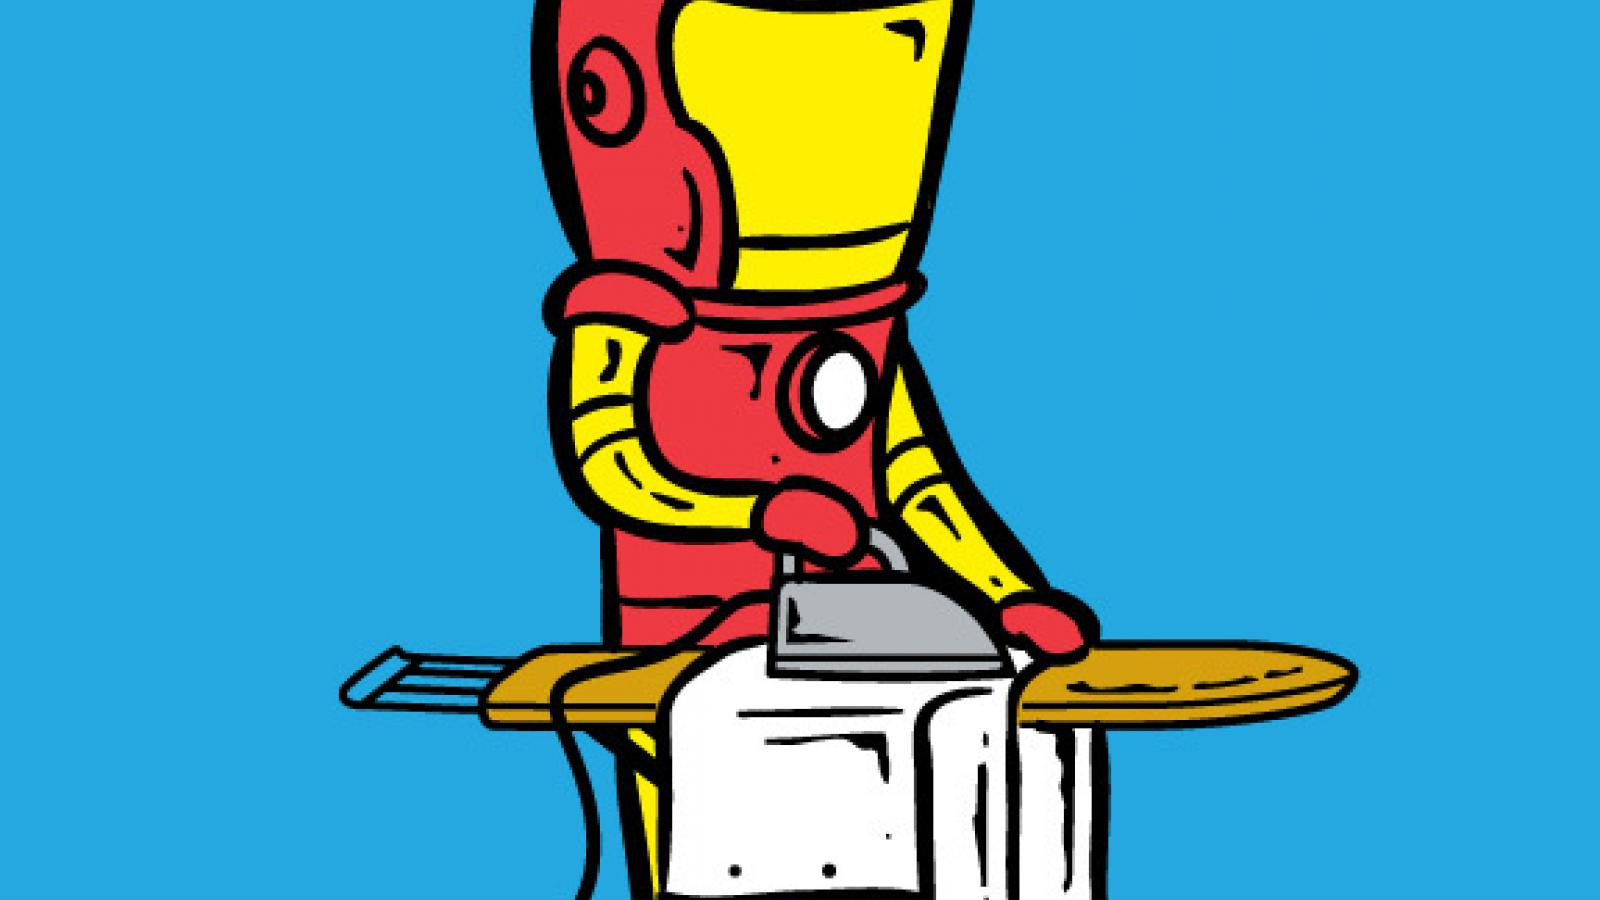 Top 5 Most Common Superhero Day Jobs